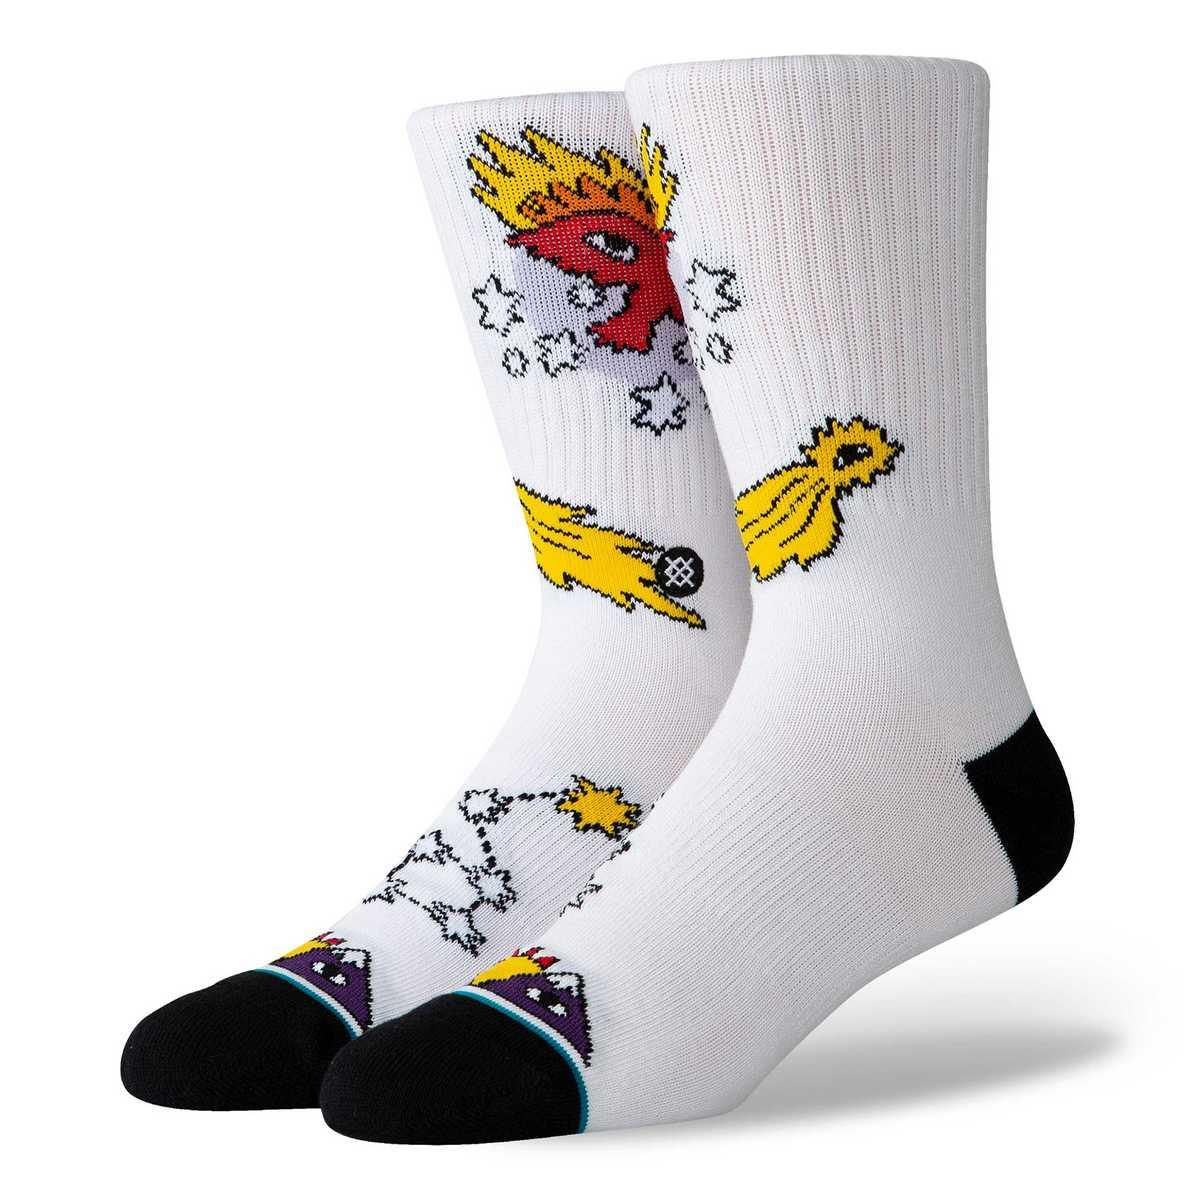 Stance Socken Cavolo Egale Star Weiß